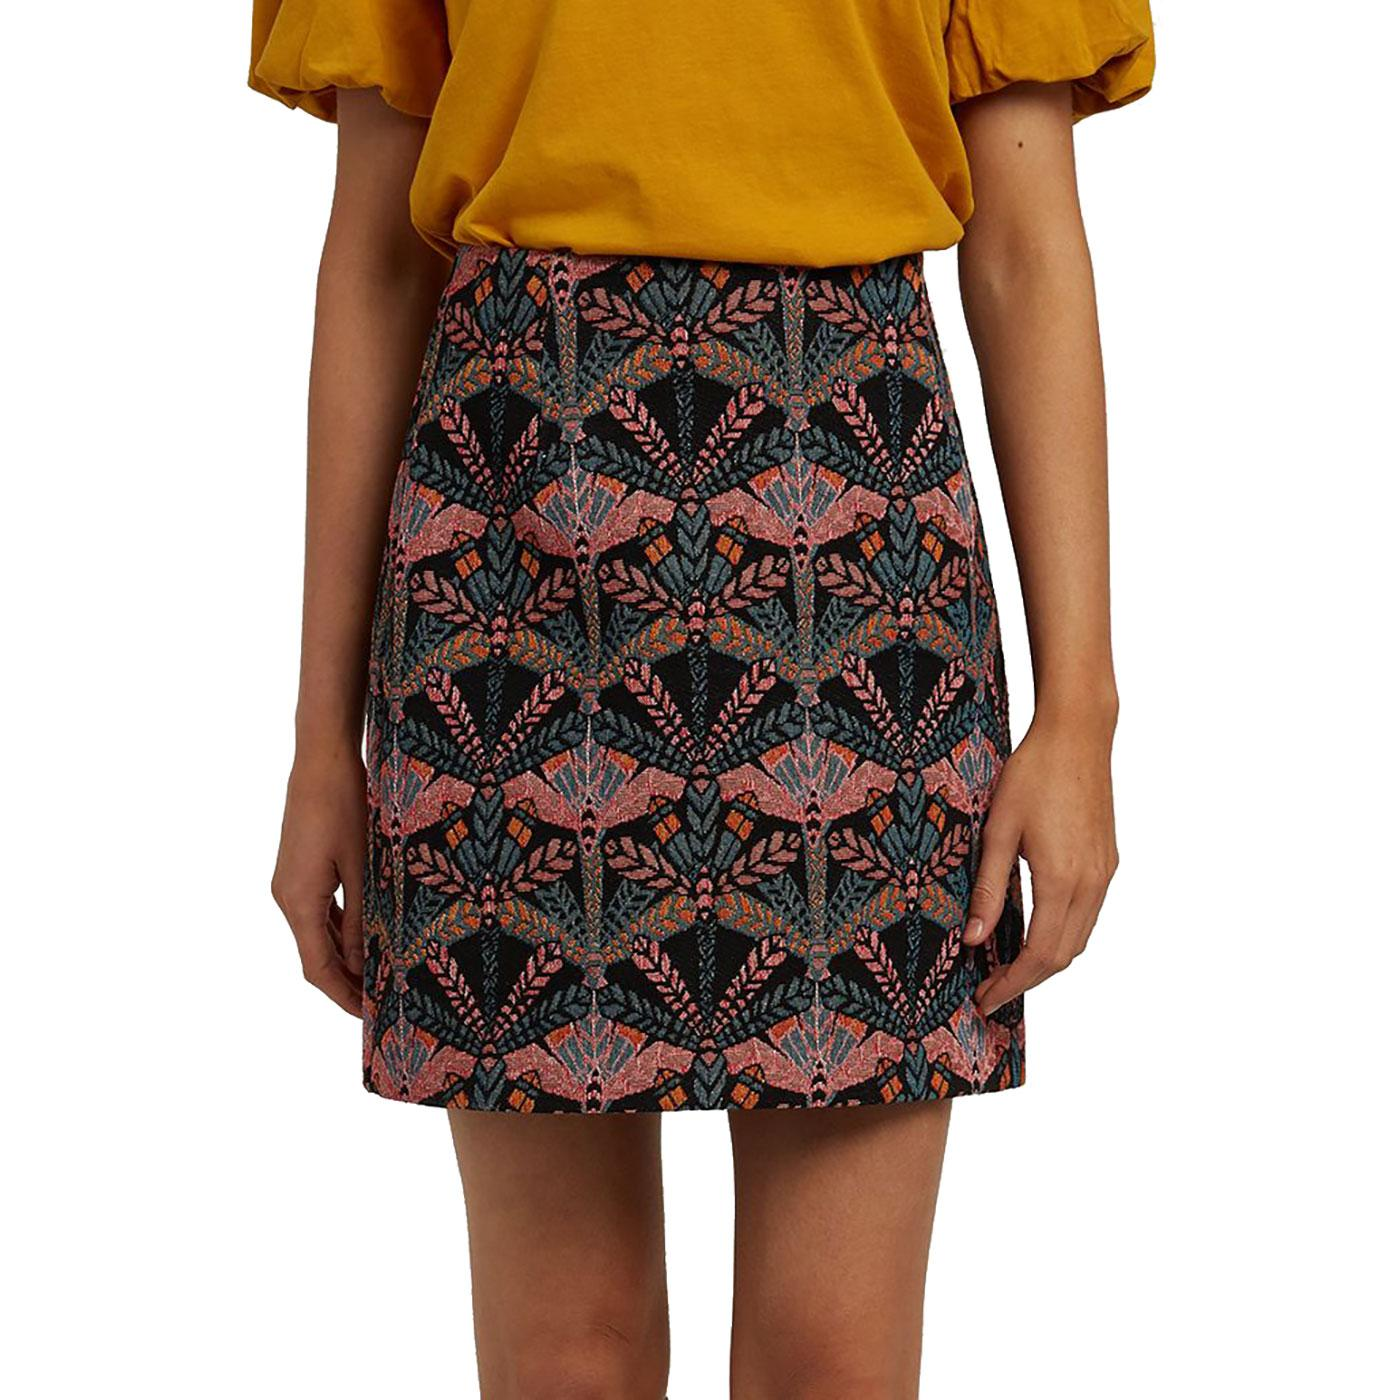 Aubin LOUCHE Woven Jacquard Dragonfly Mini Skirt